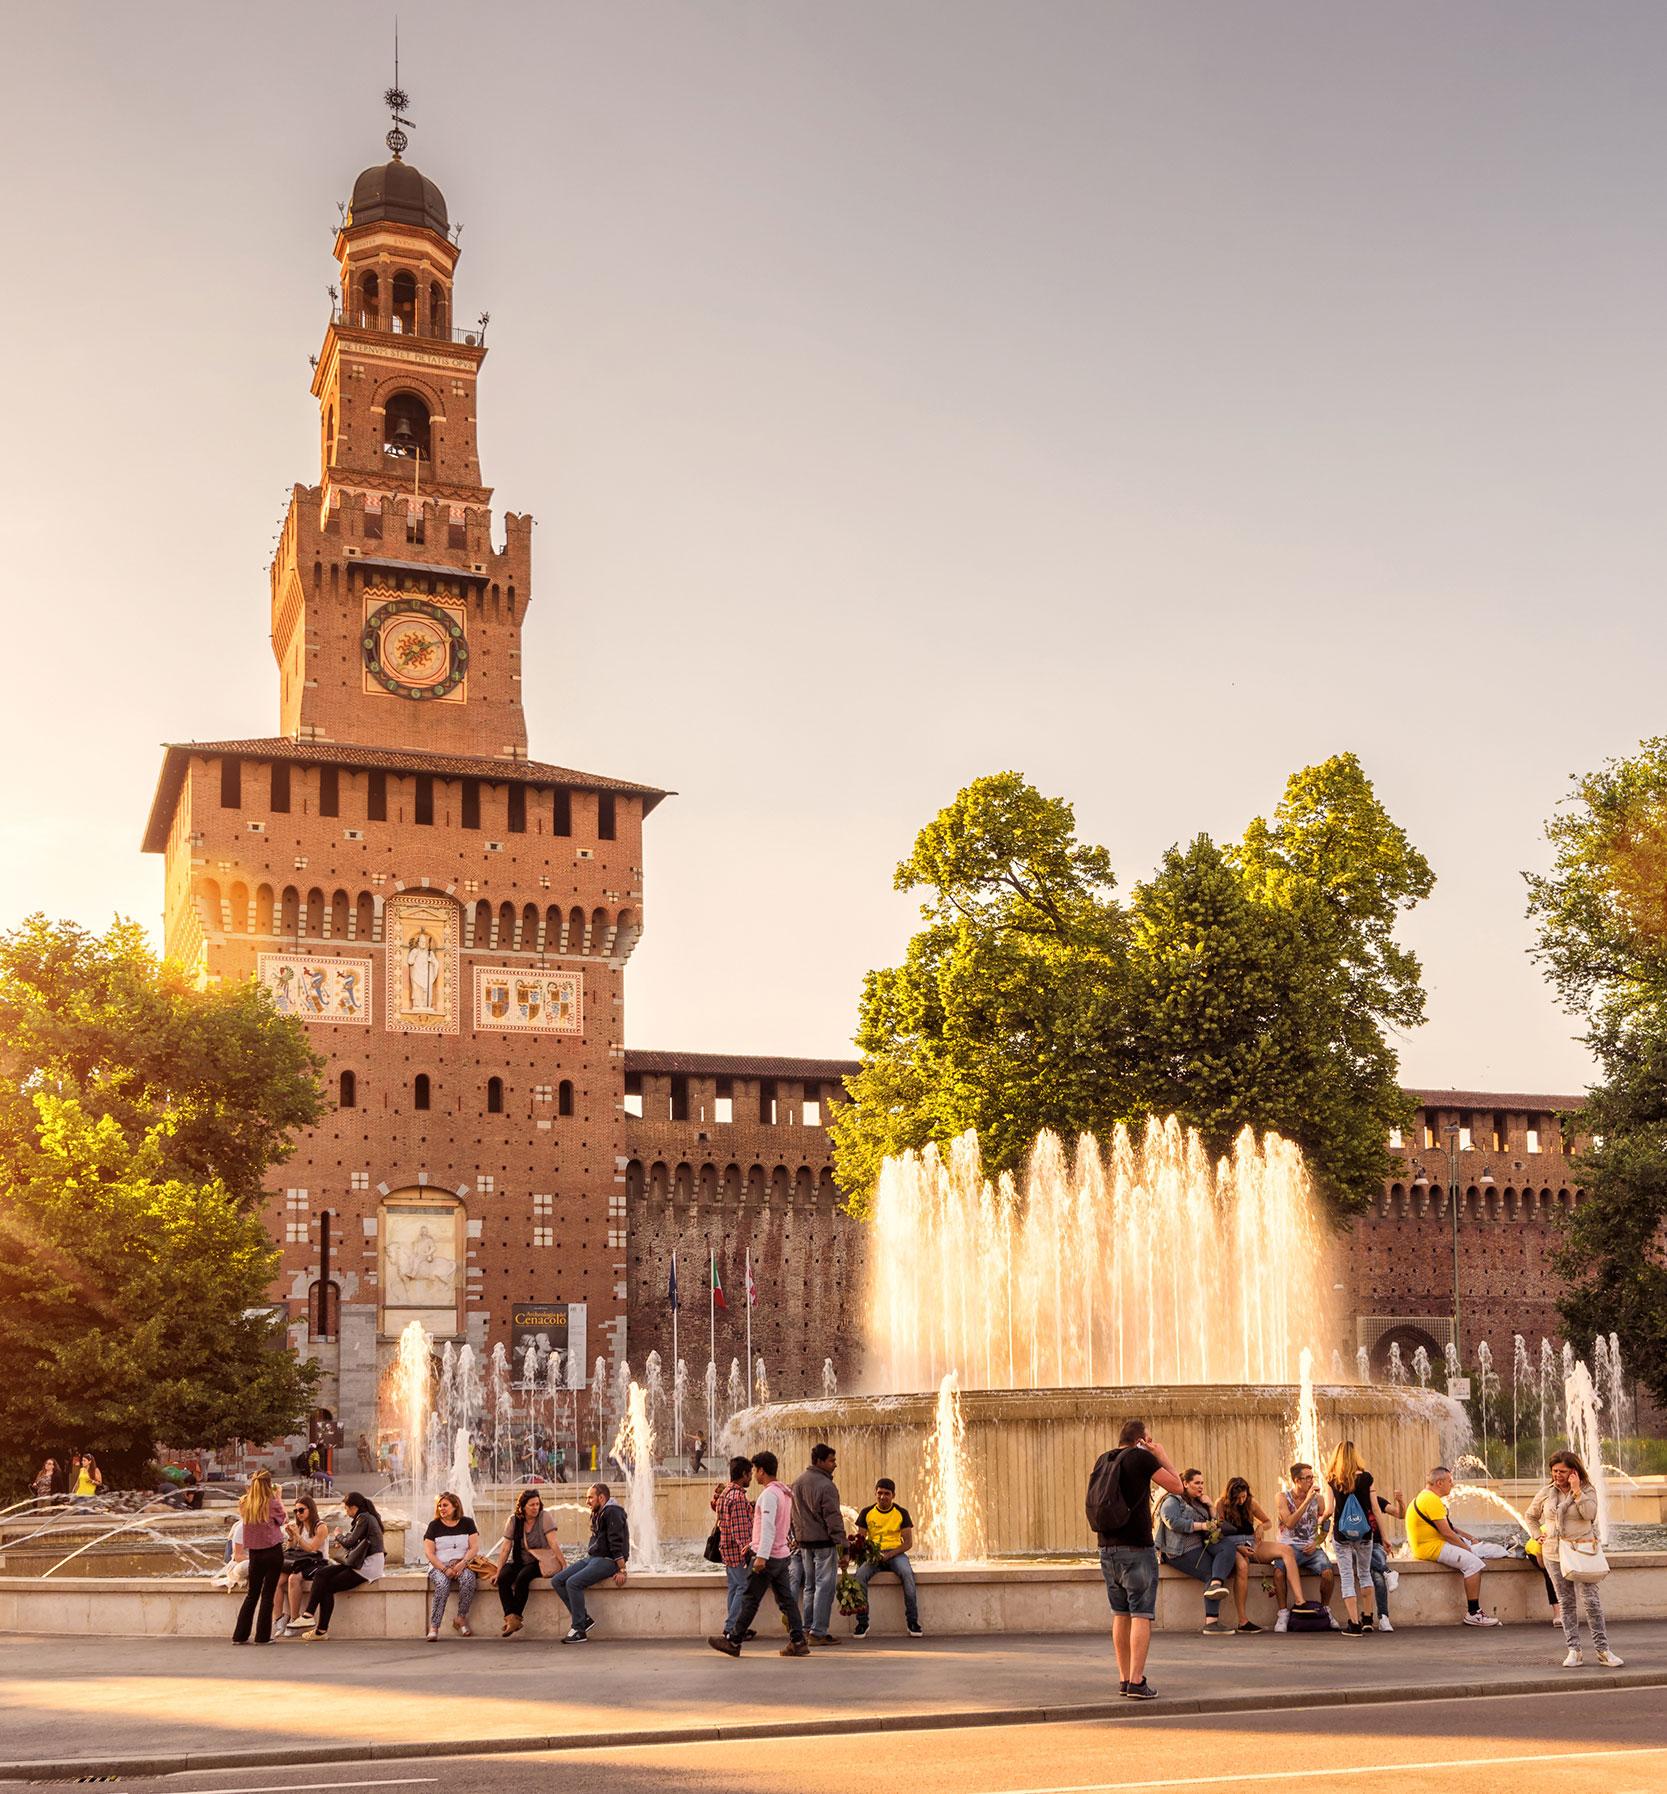 Castello Sforzesco, Piazza Castello, Milan, Italy